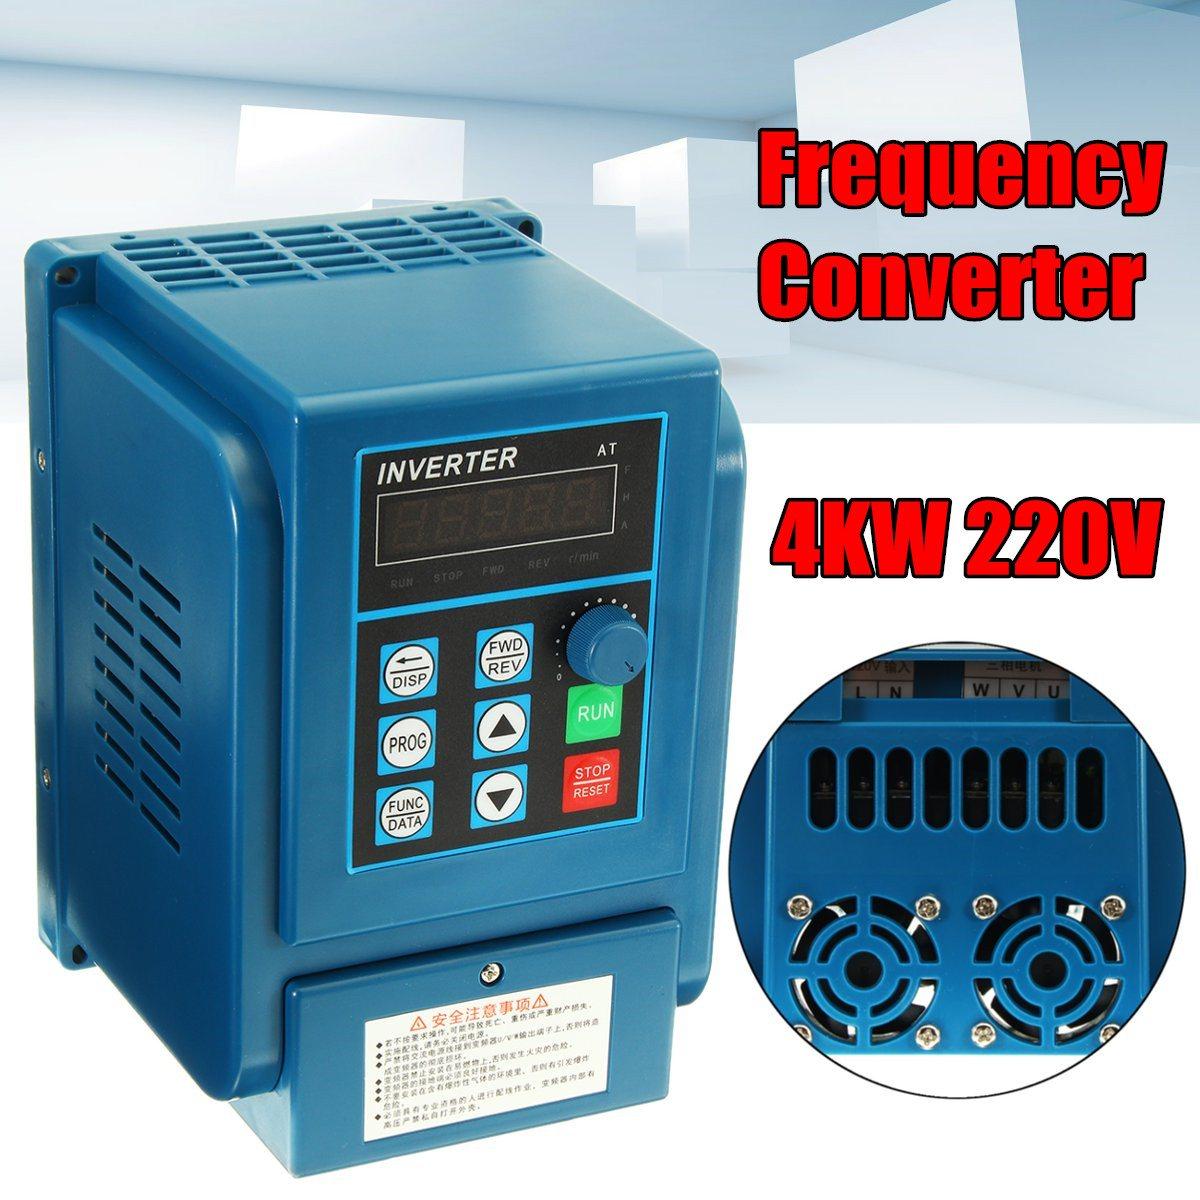 220V 4KW 50HZ/60HZ 5HP Variable Frequency Drive Inverter VFD tp760 765 hz d7 0 1221a